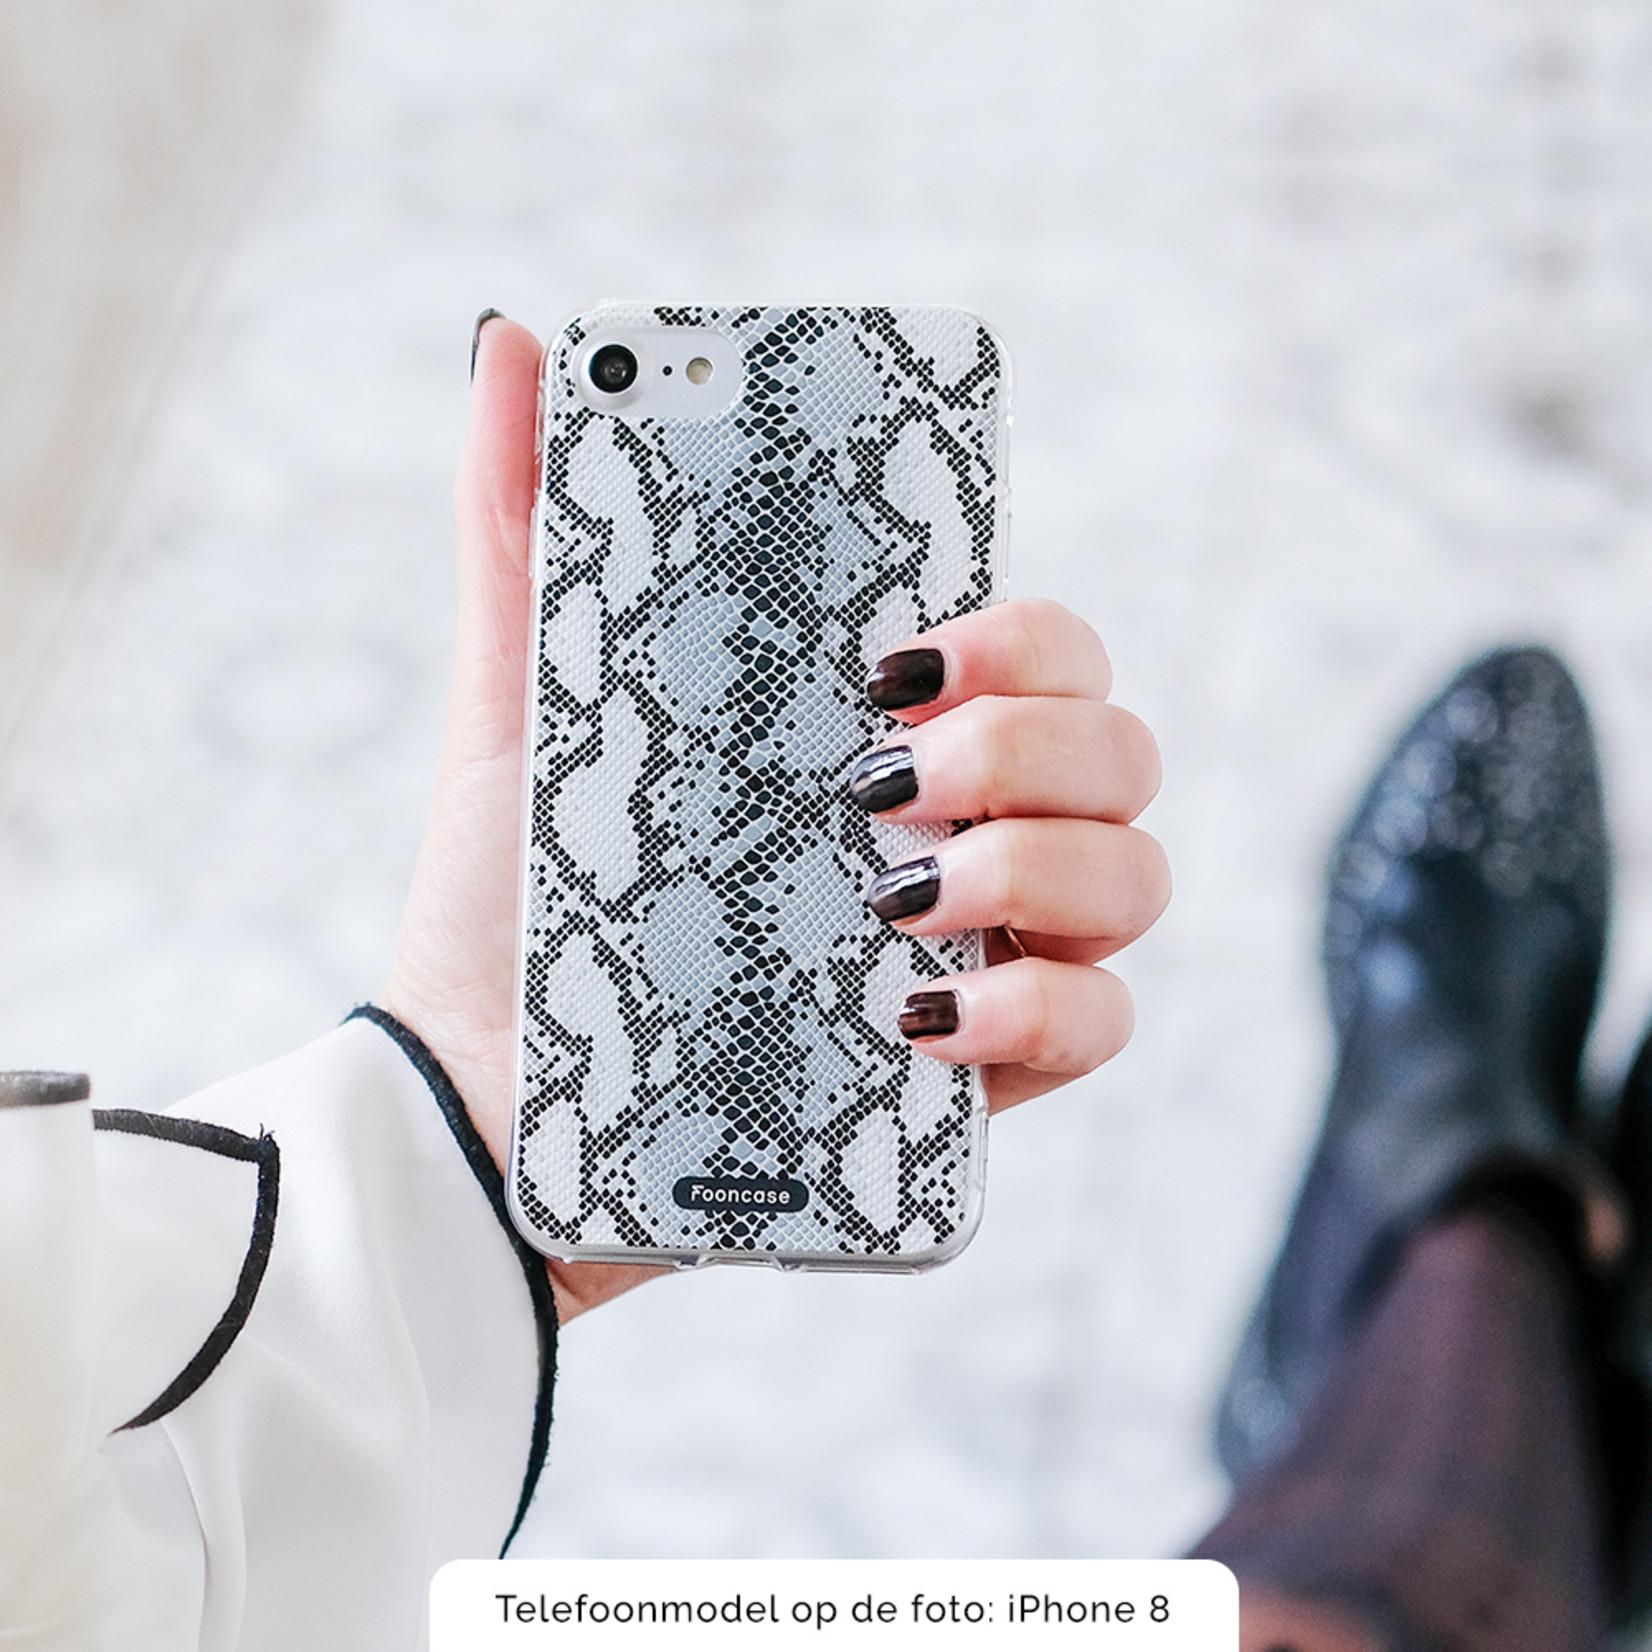 FOONCASE Iphone 11 Handyhülle - Snake it!